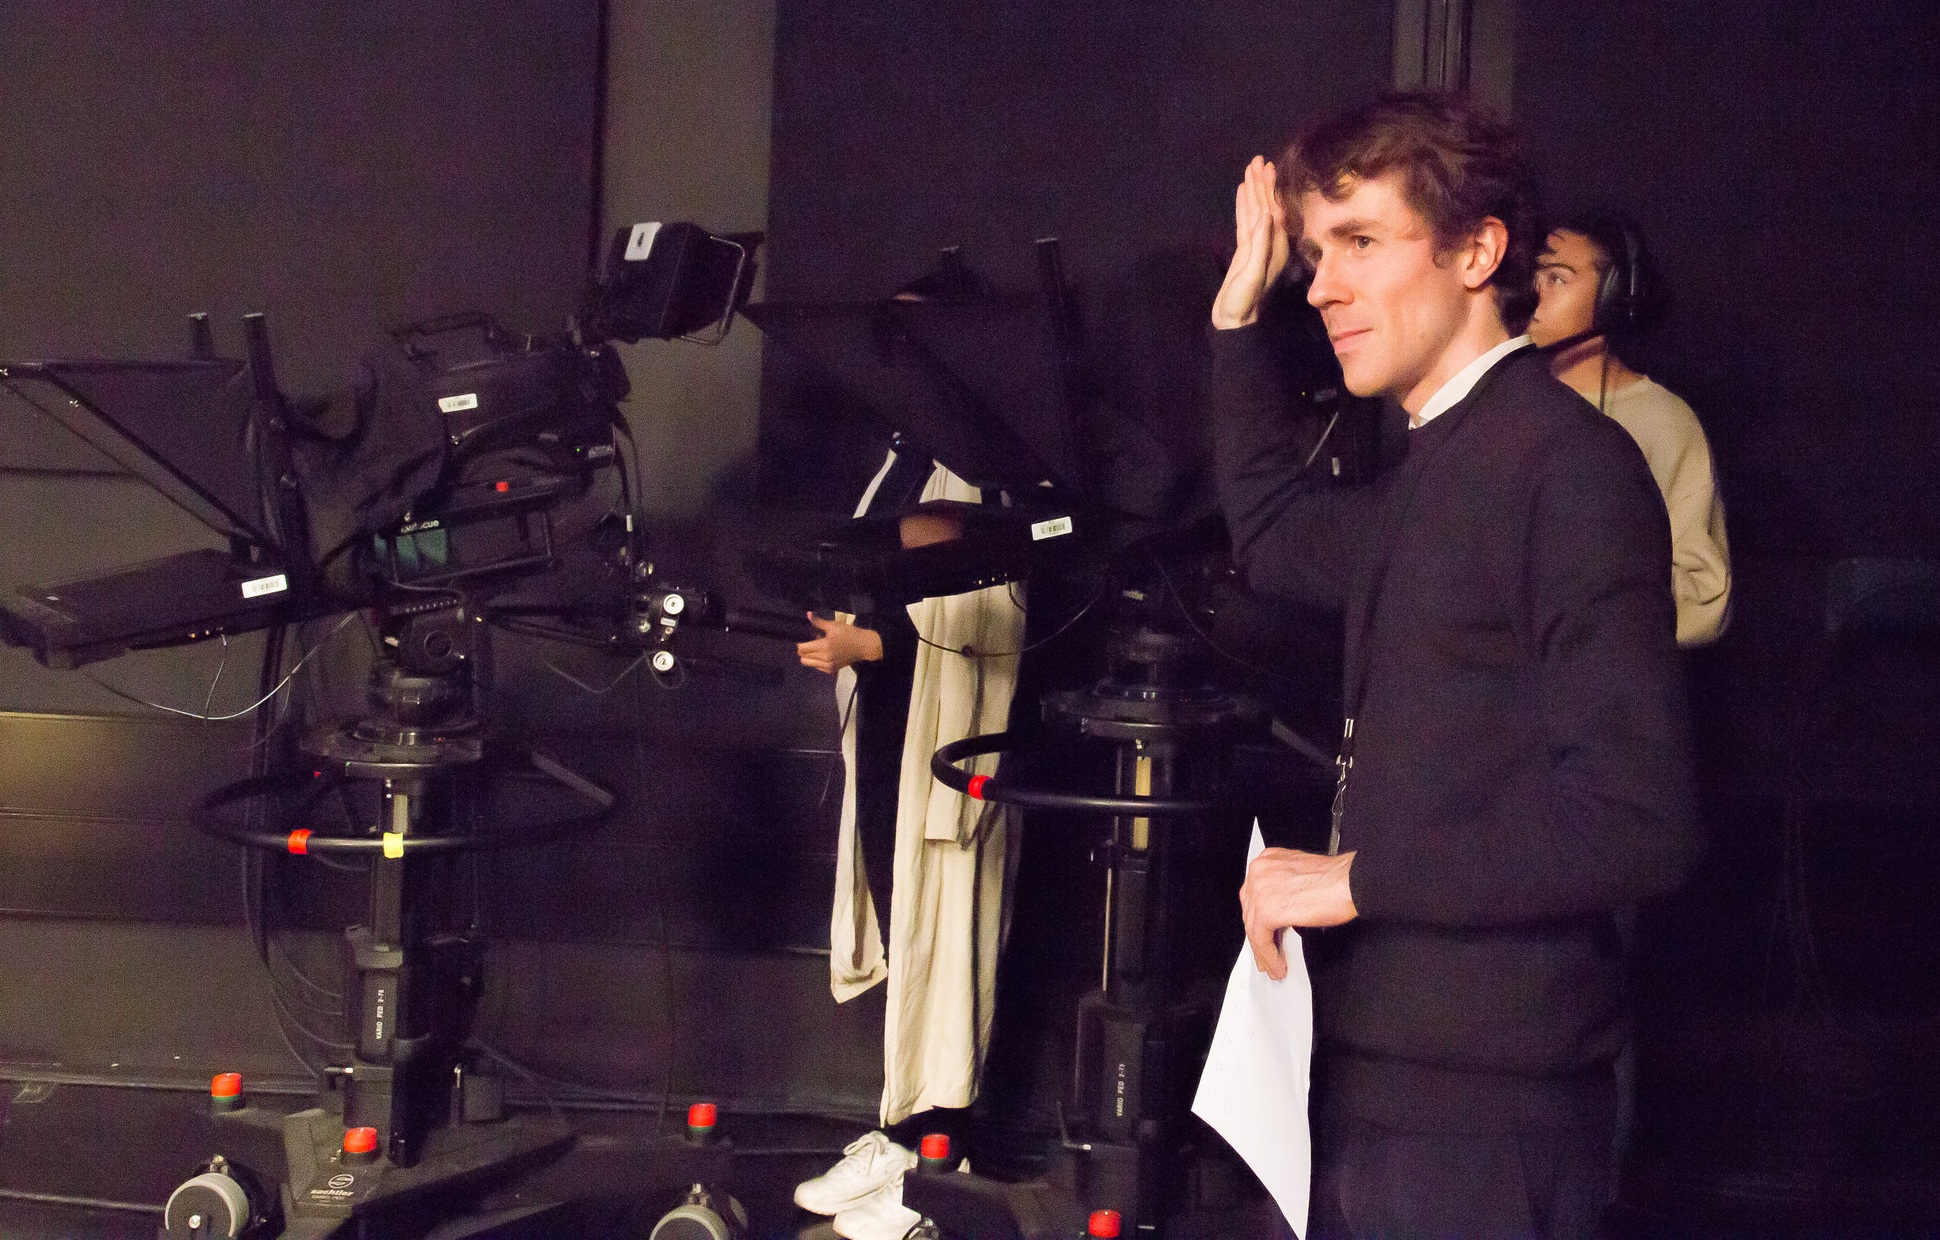 Executive Producer, Dean Watson on his TV special, Silent Comedy